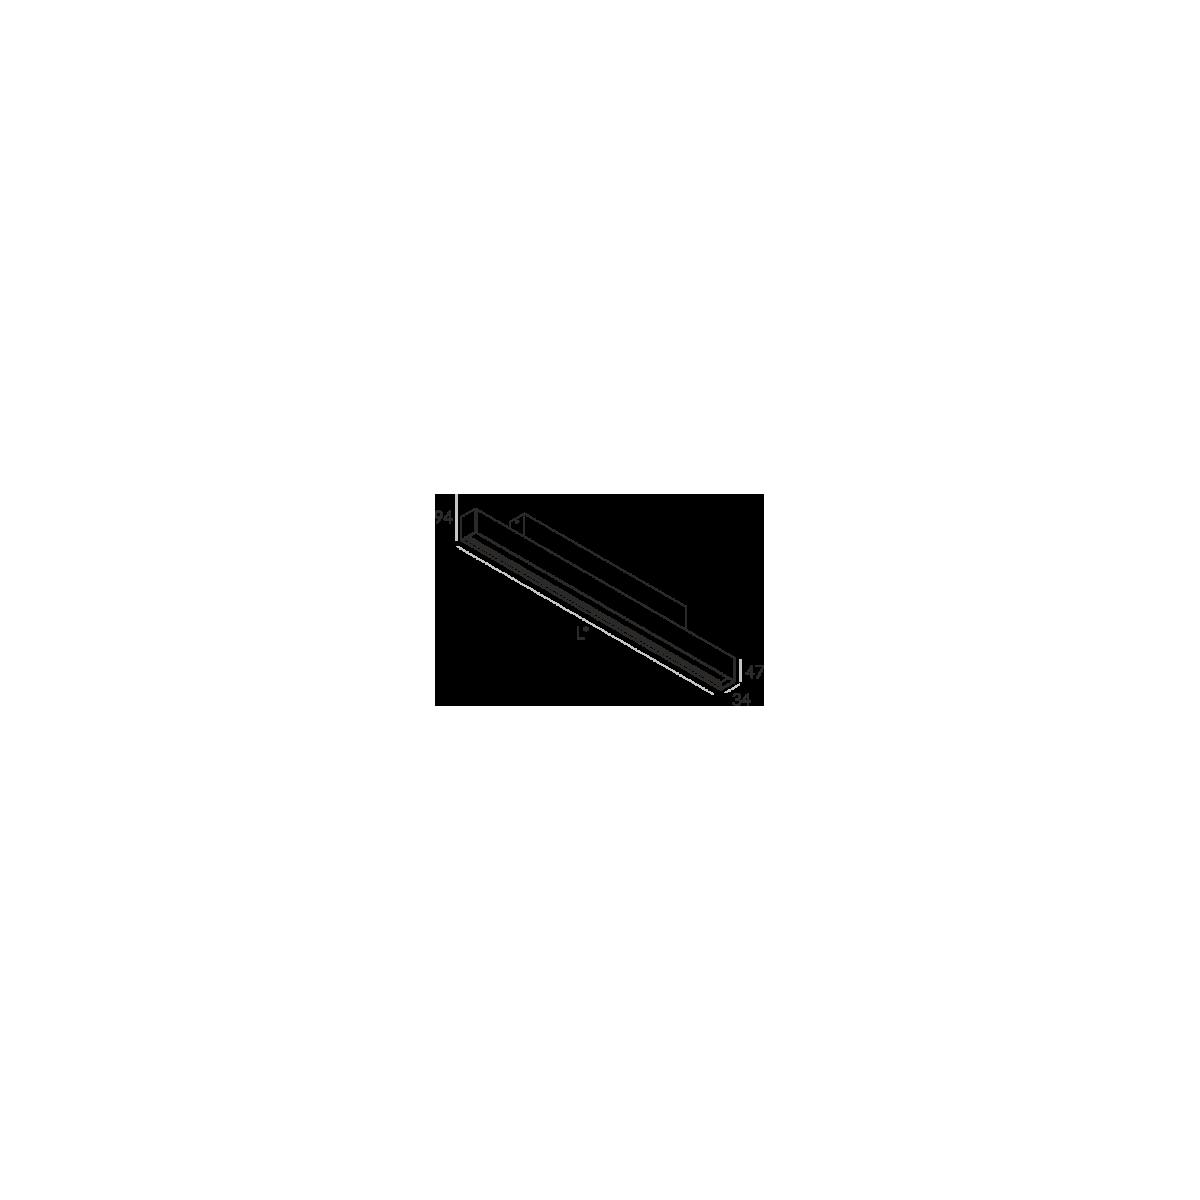 Labra RAY NT.854mm 35W 6-0615 Sufitowa